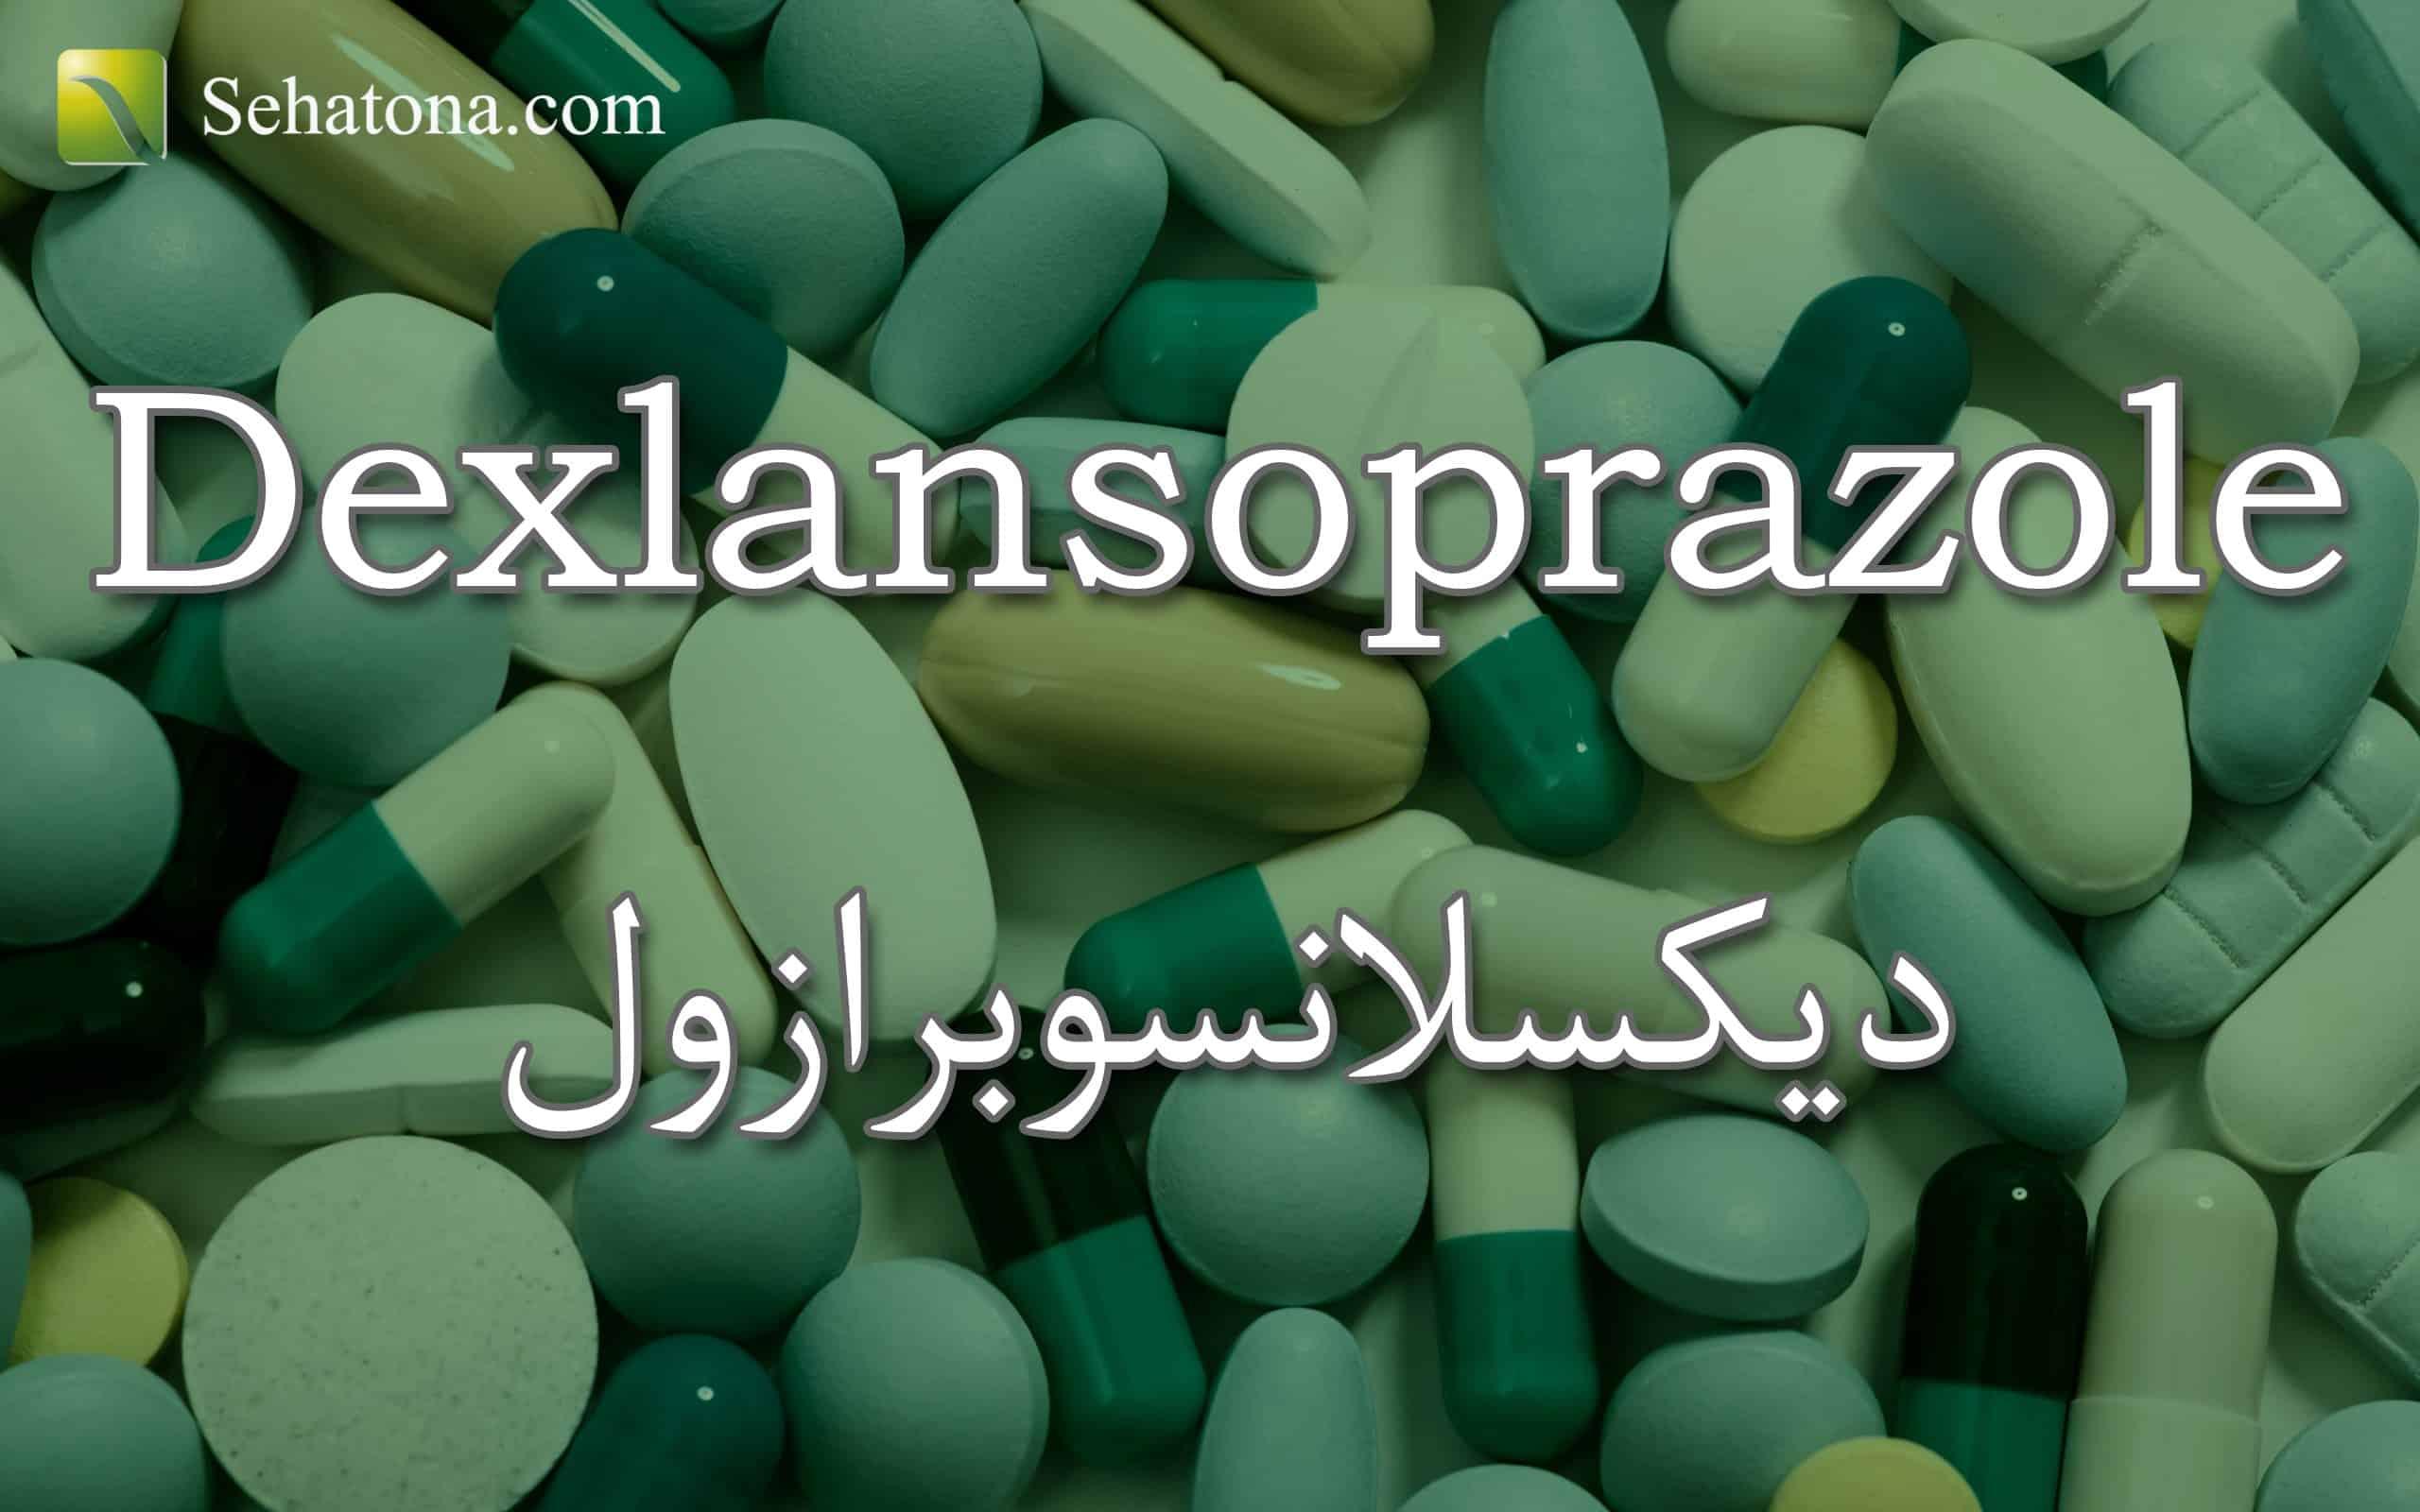 Dexlansoprazole